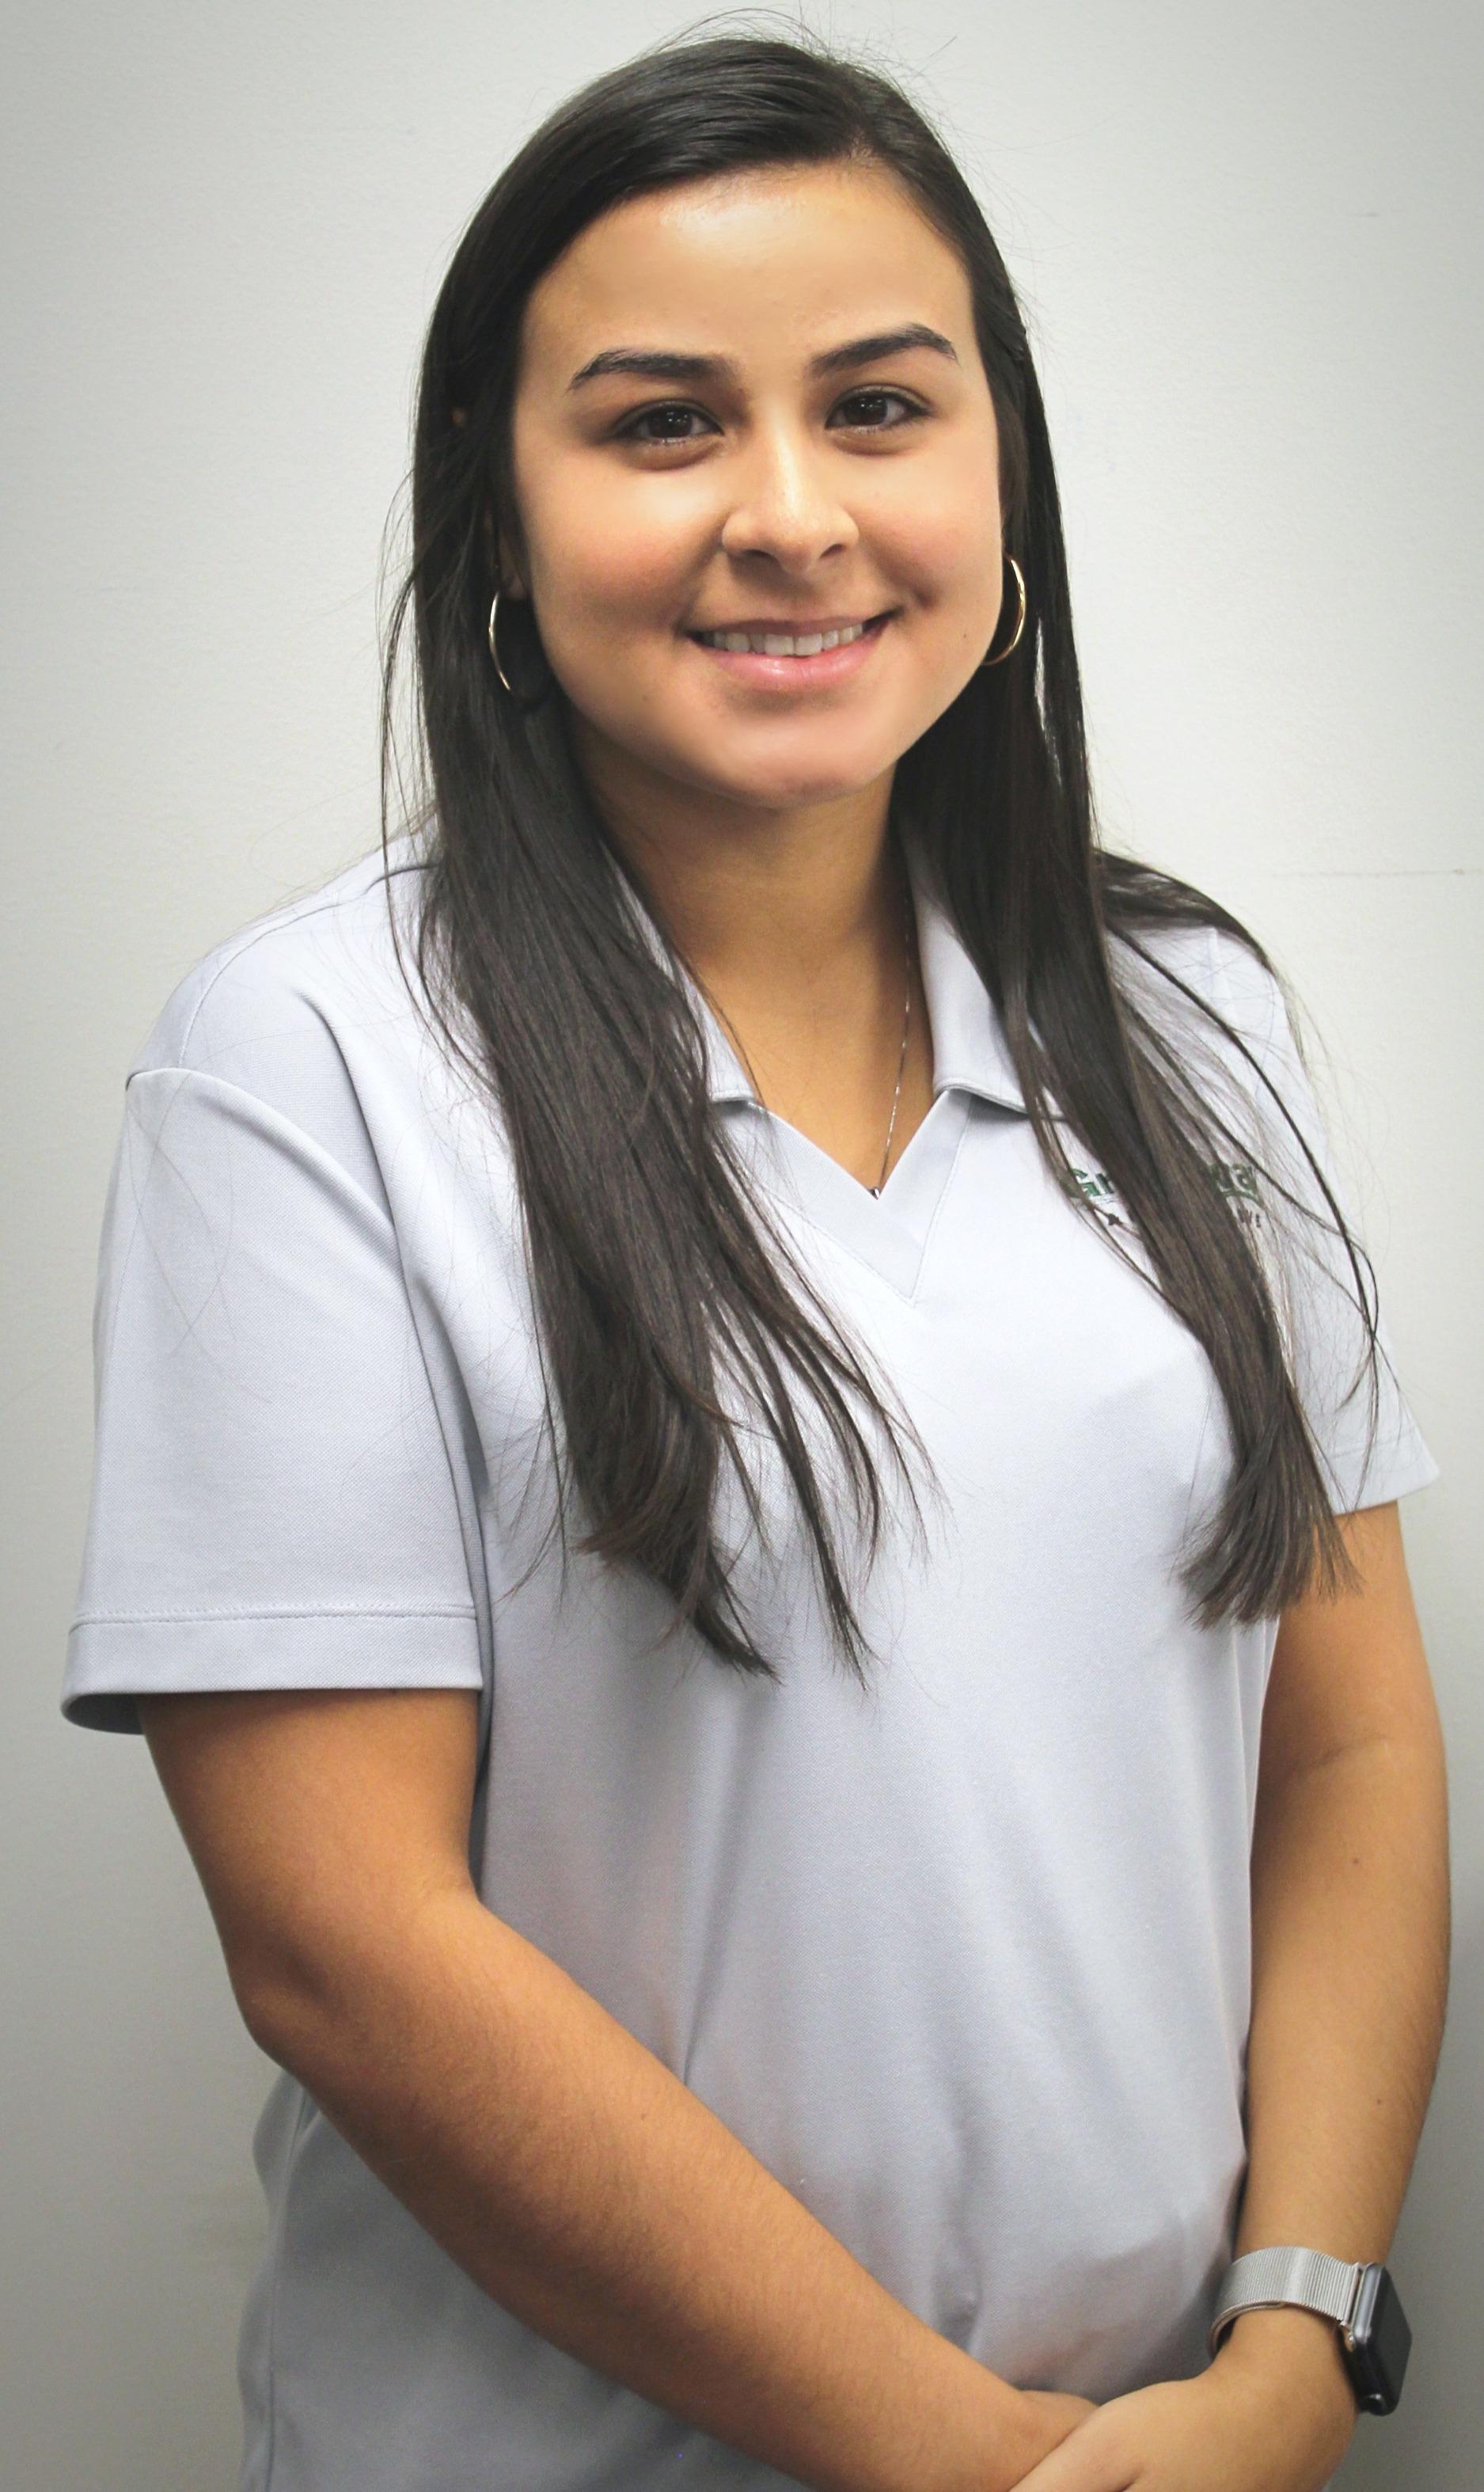 Candice Gonzalez Bio Image